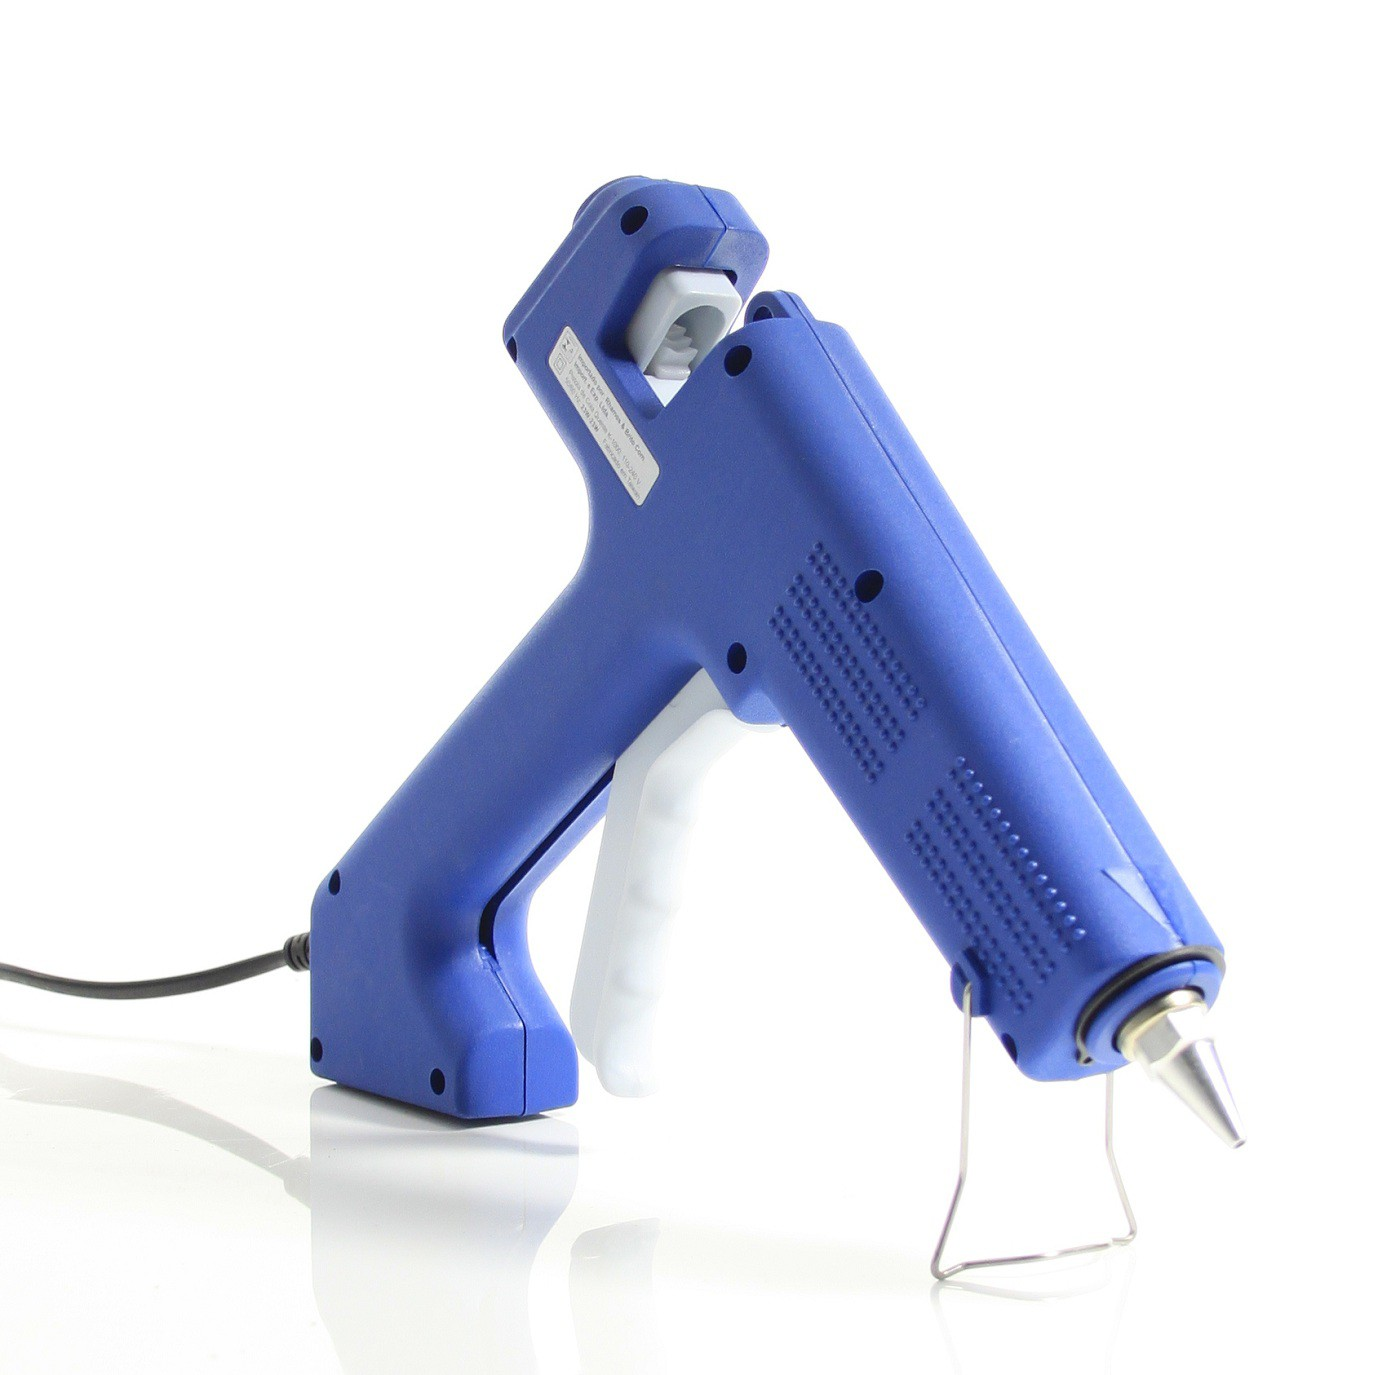 Pistola de Cola Quente (grossa) K-1000